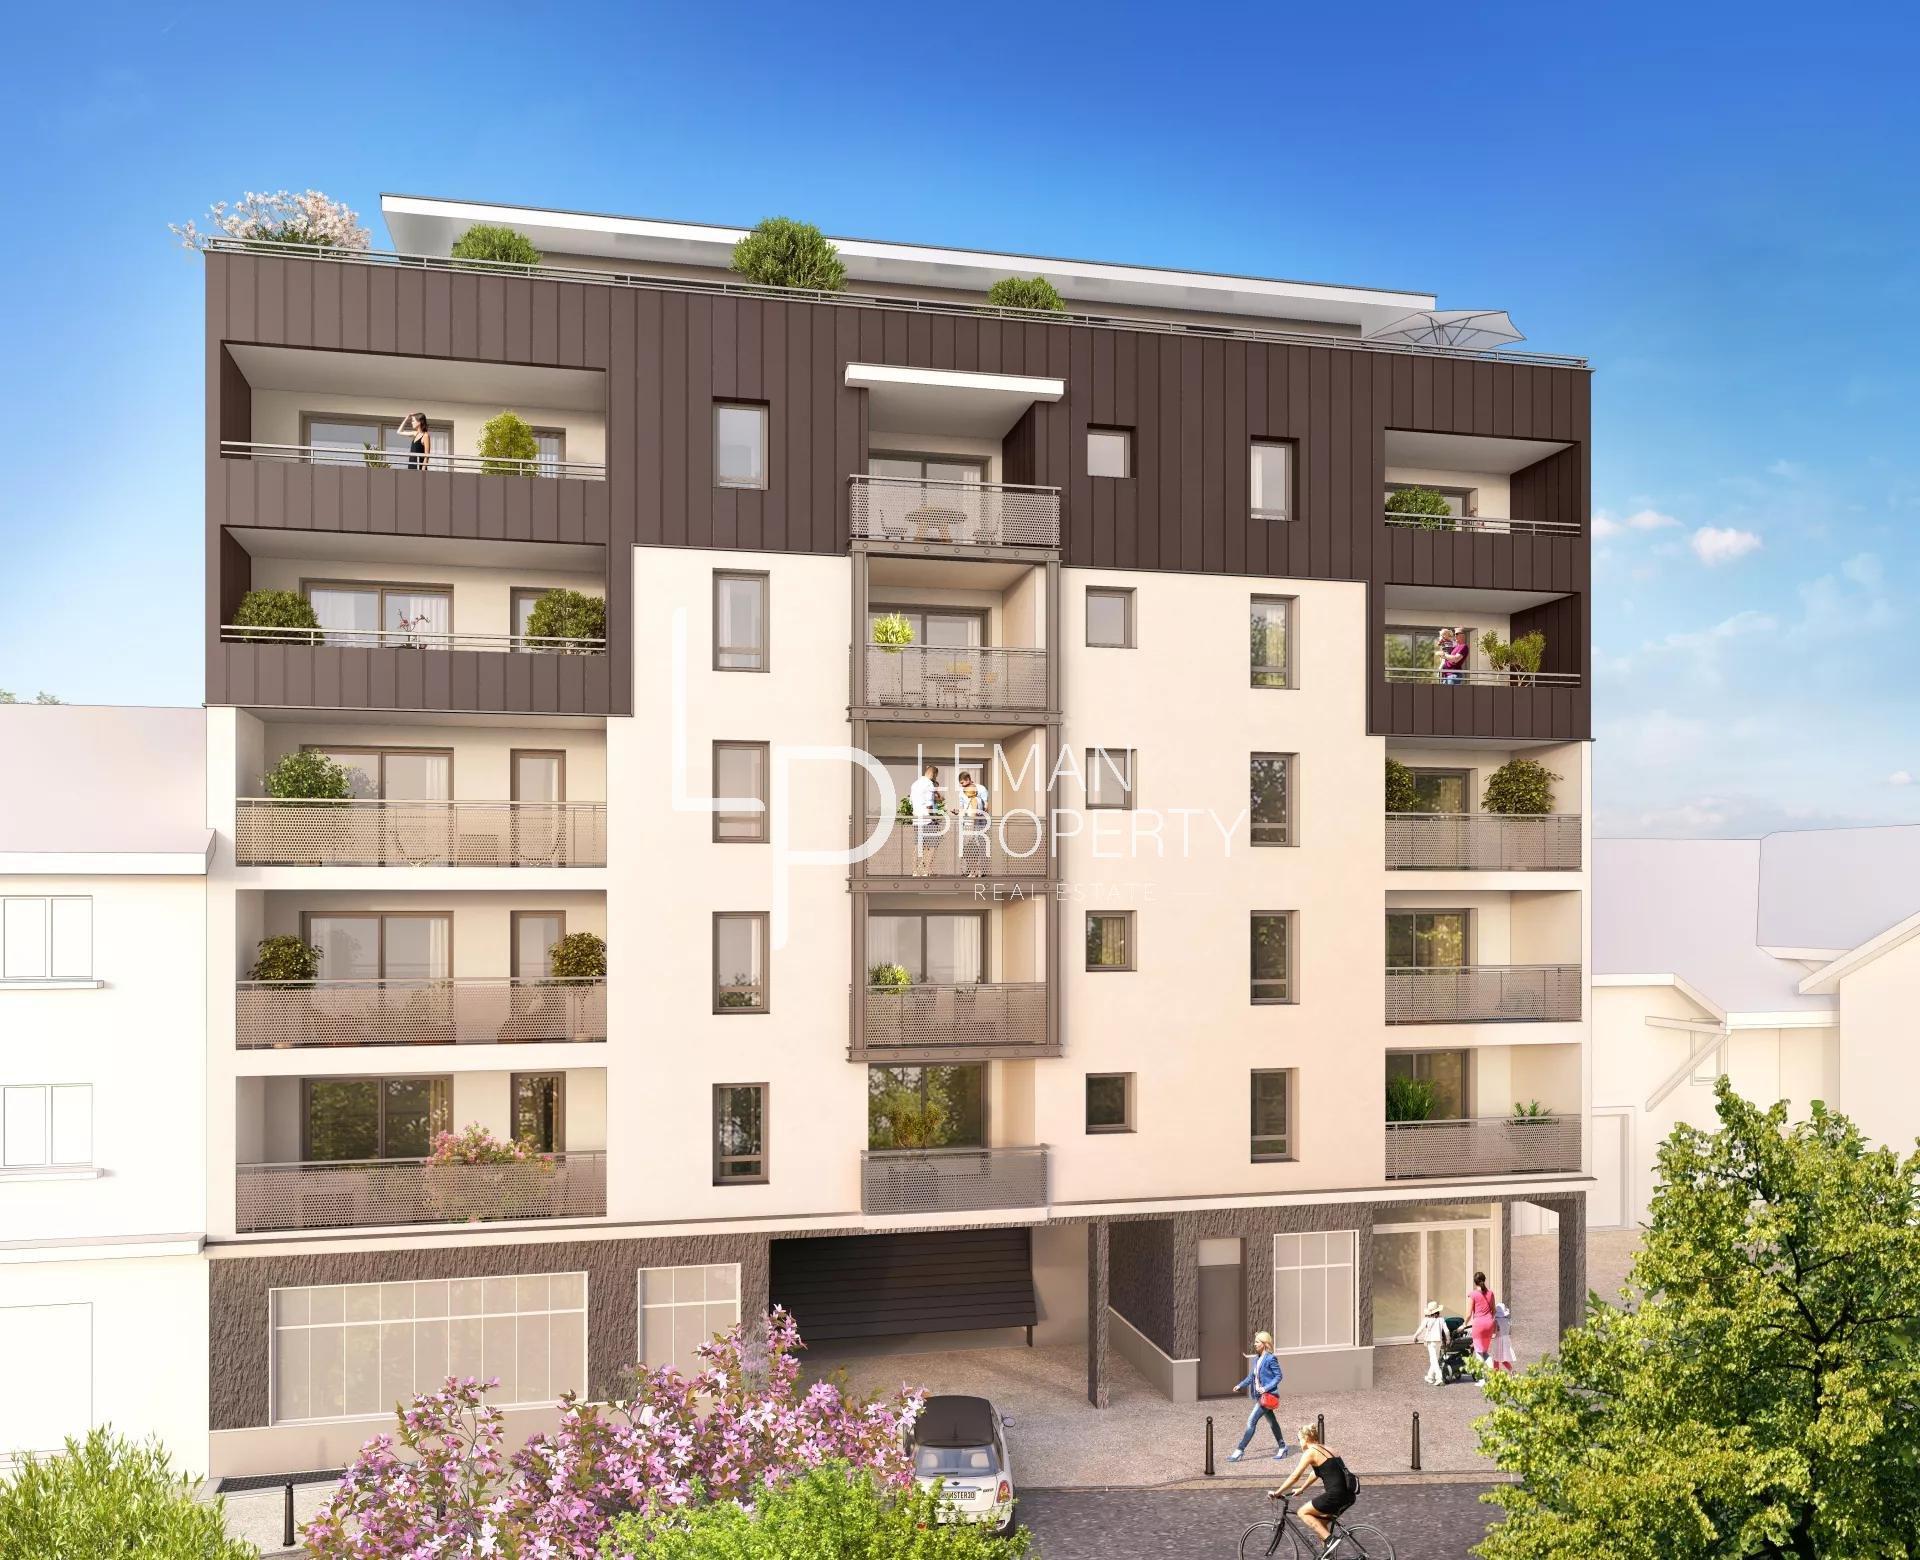 A vendre T3 neuf - Thonon centre-ville